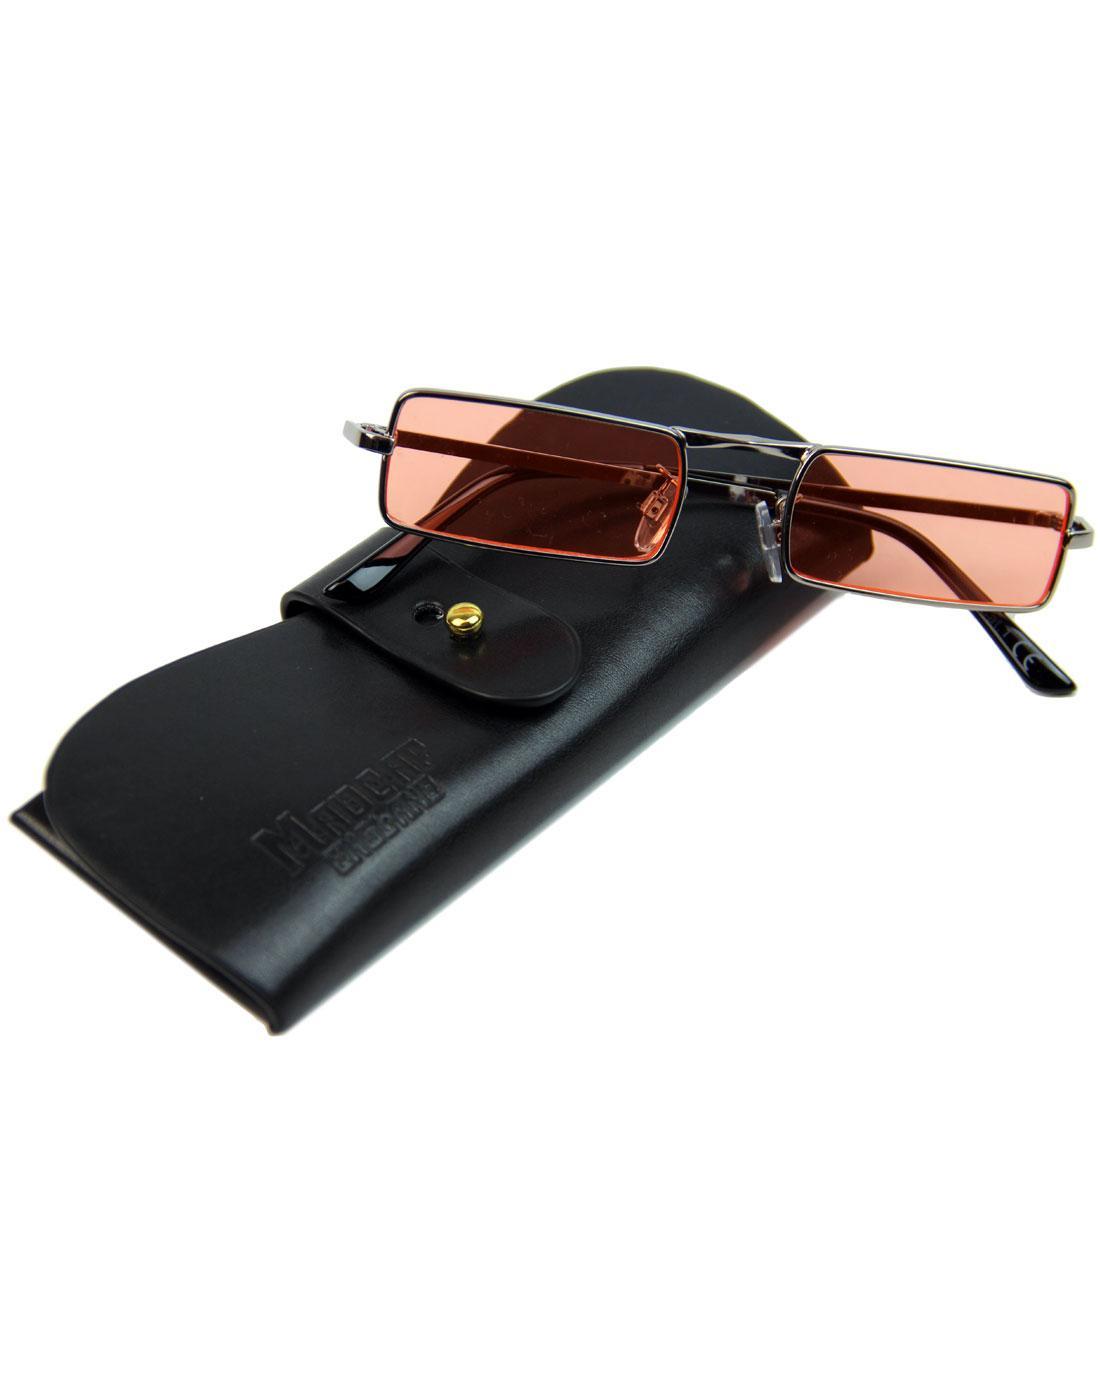 7333630a37 MADCAP ENGLAND McGuinn 60s Mod Psychedelic Granny Glasses Orange